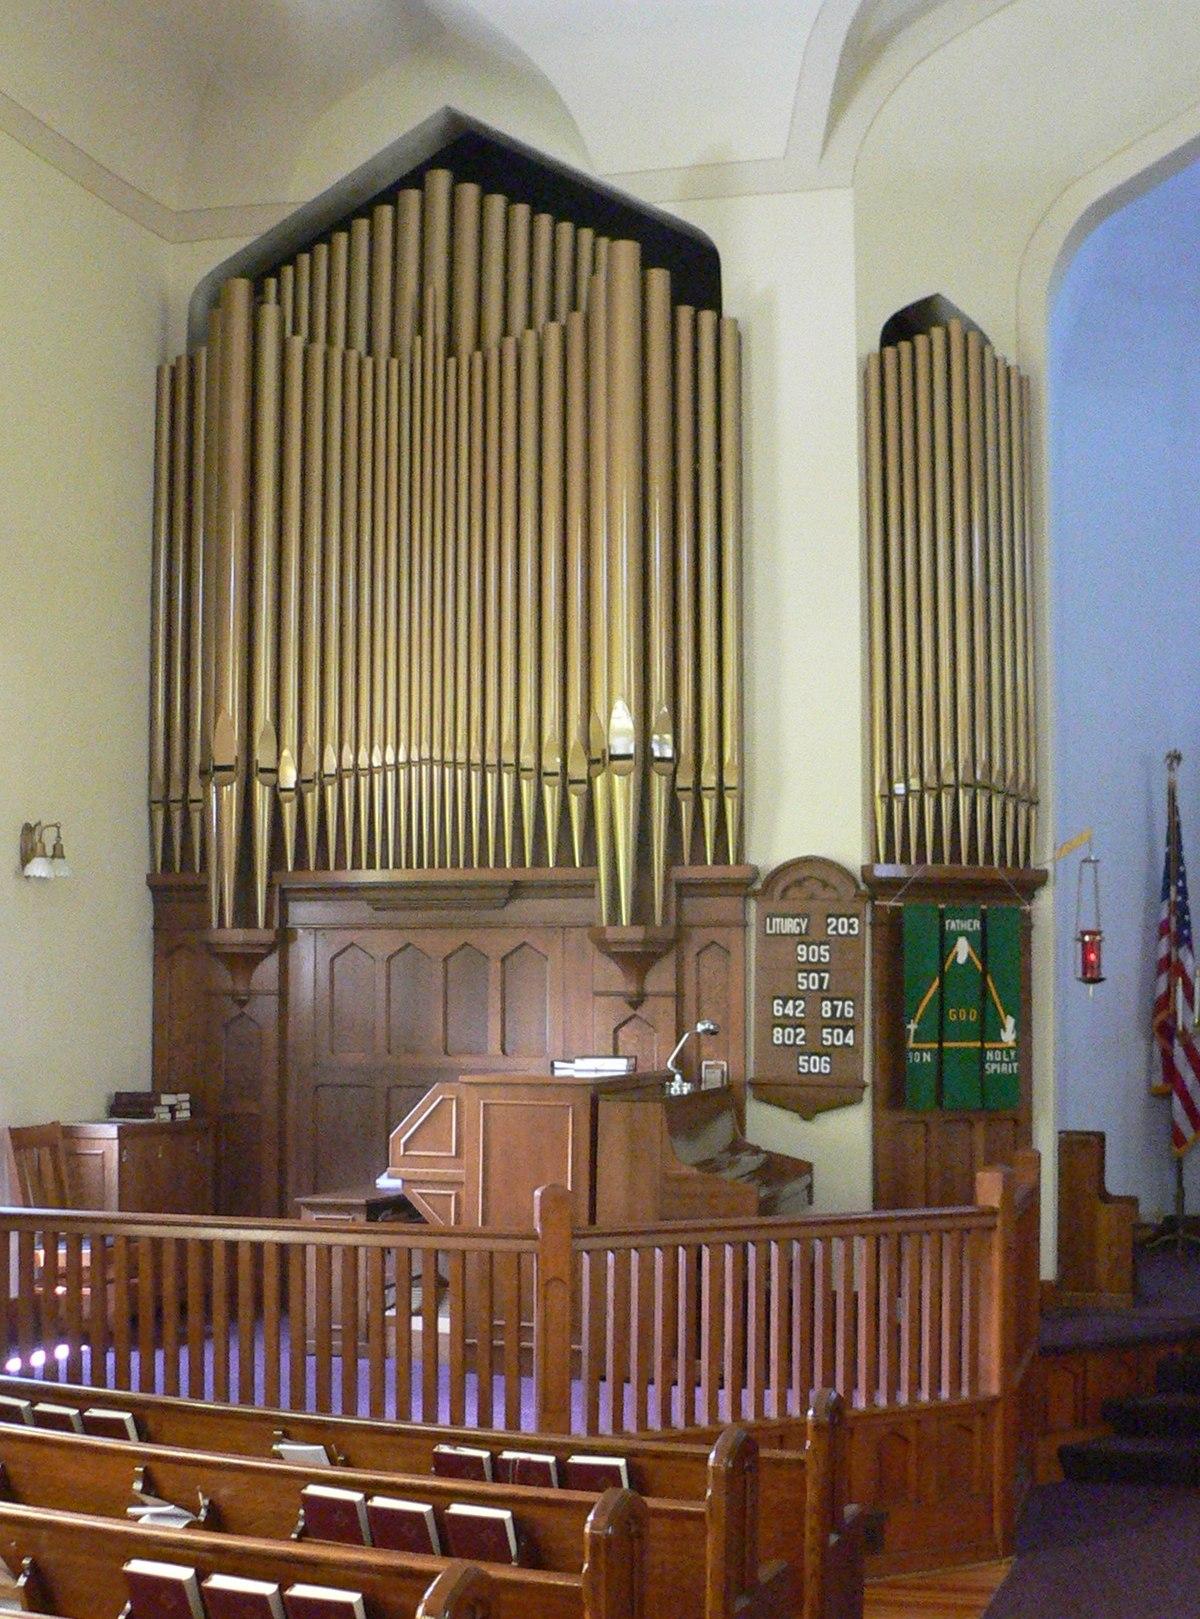 hinners organ company wikipedia